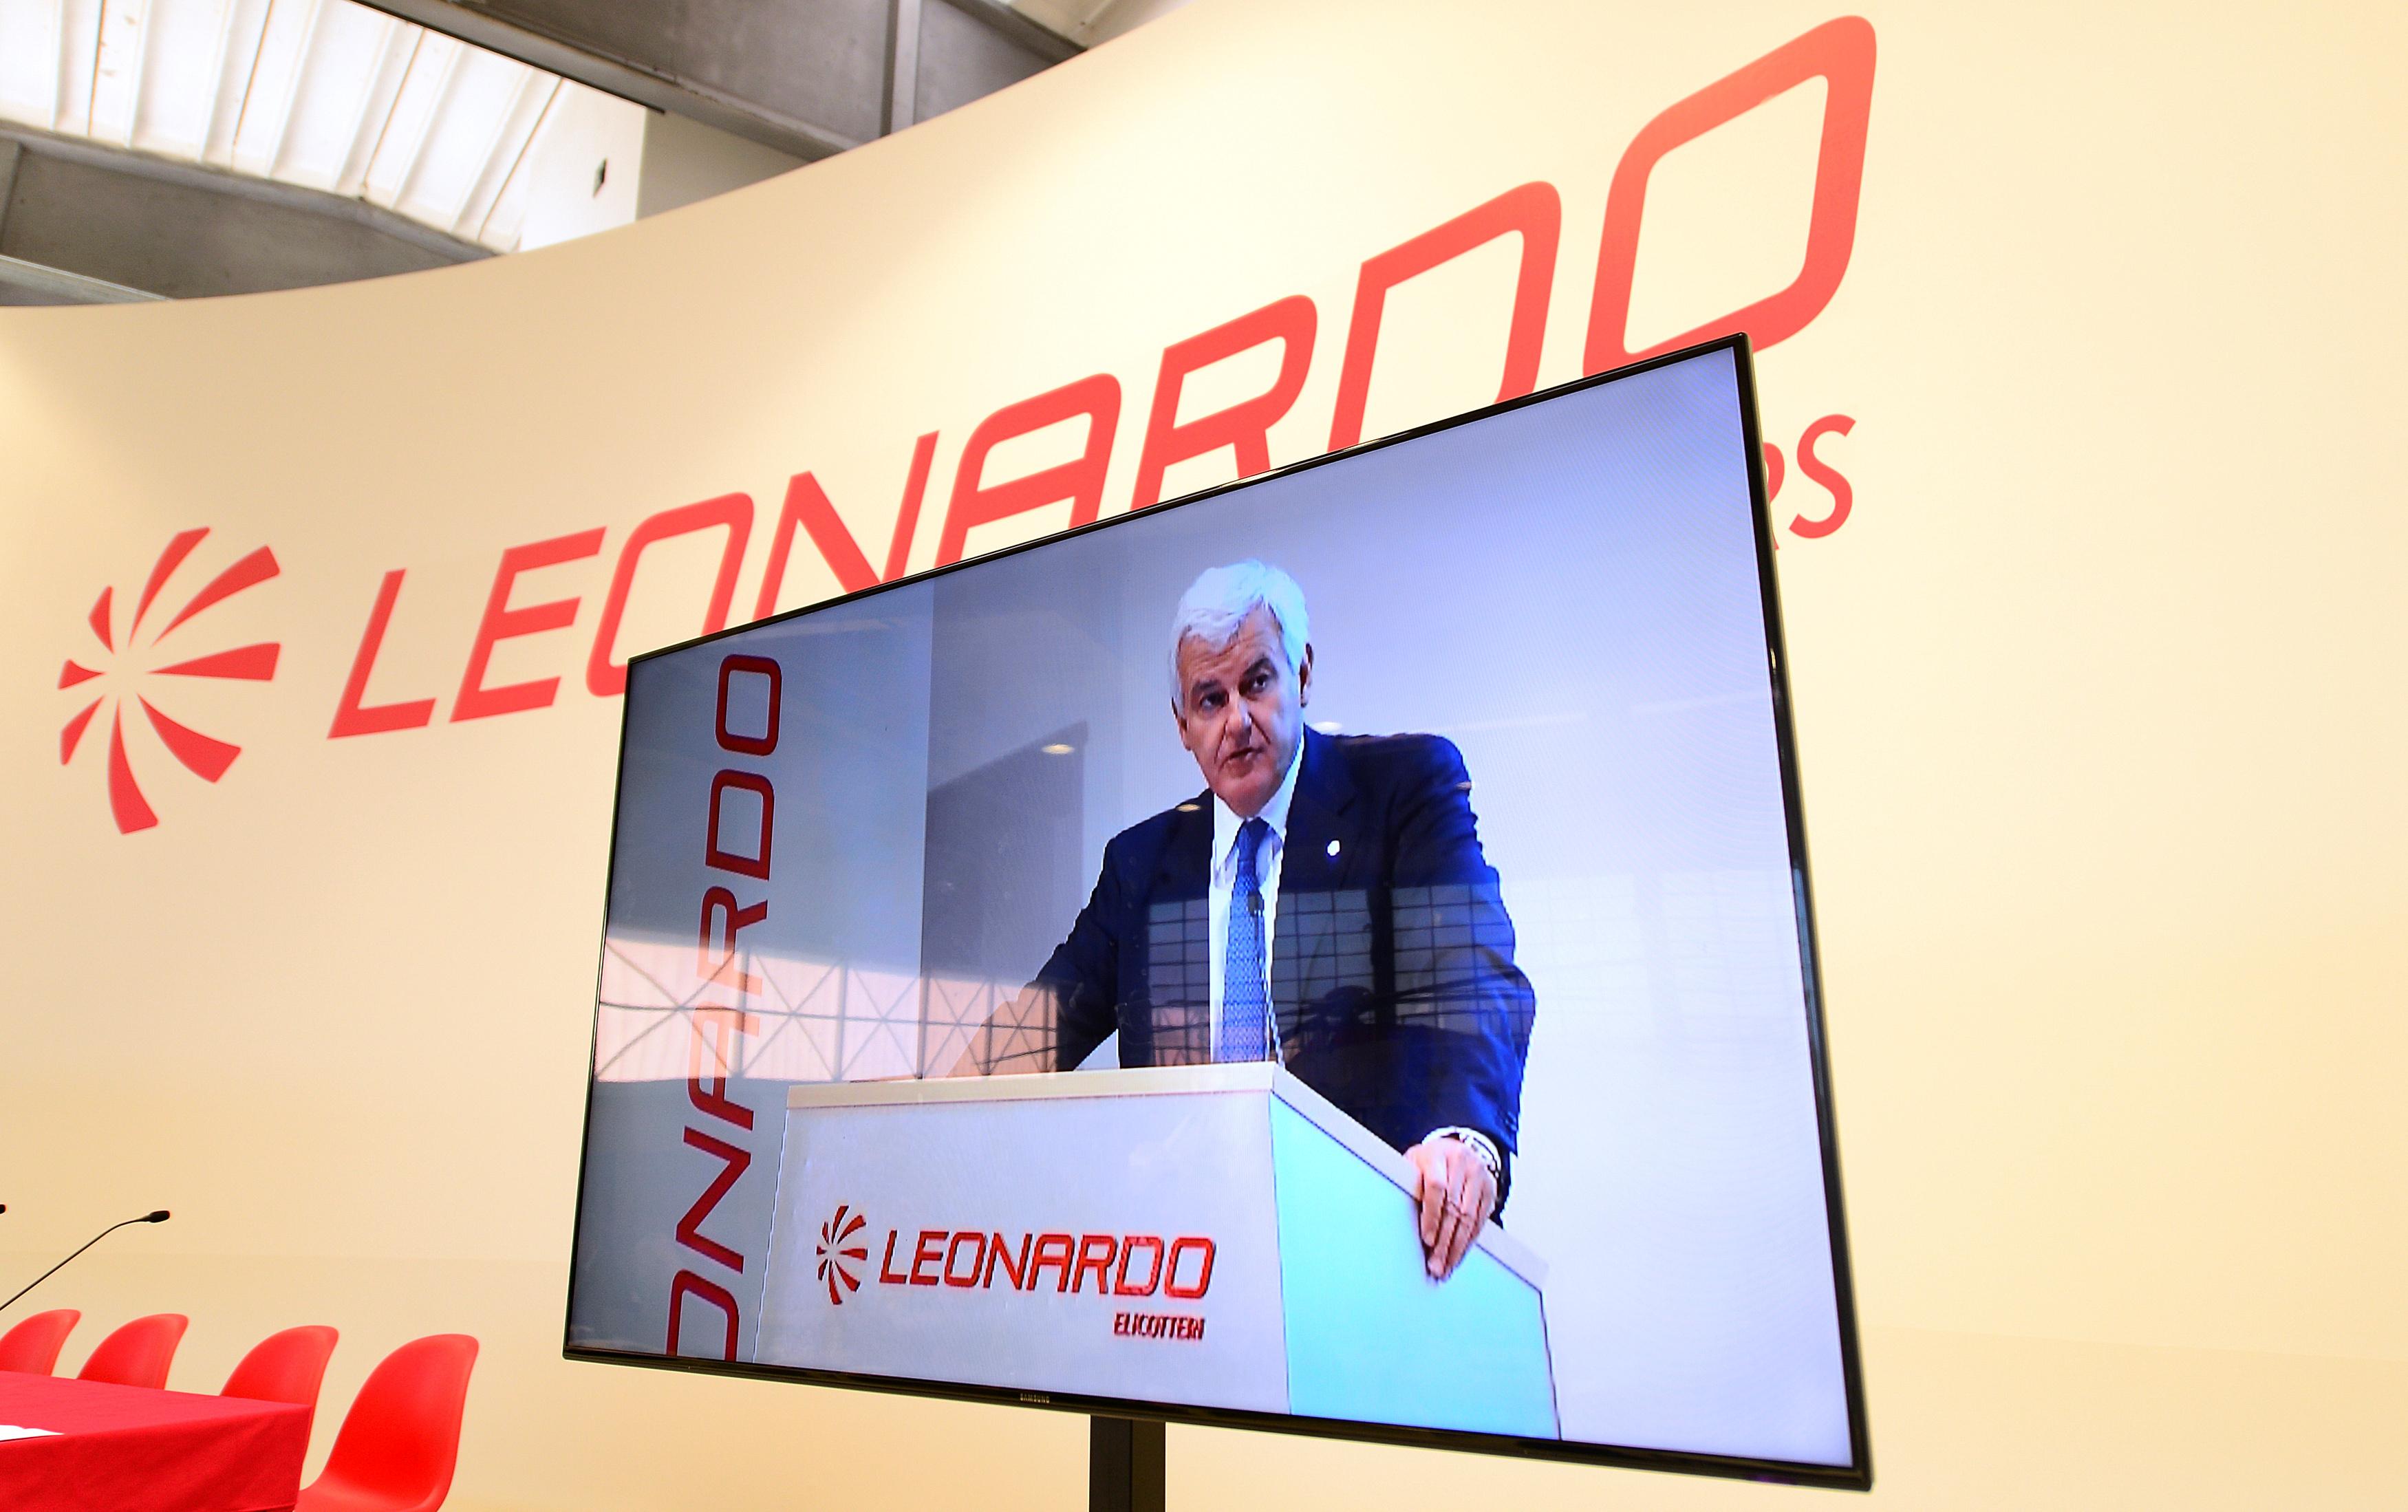 Leonardo's CEO Alessandro Profumo is seen on a screen at the headquarters in Vergiate, near Milan, Italy, January 30, 2018. REUTERS/Massimo Pinca